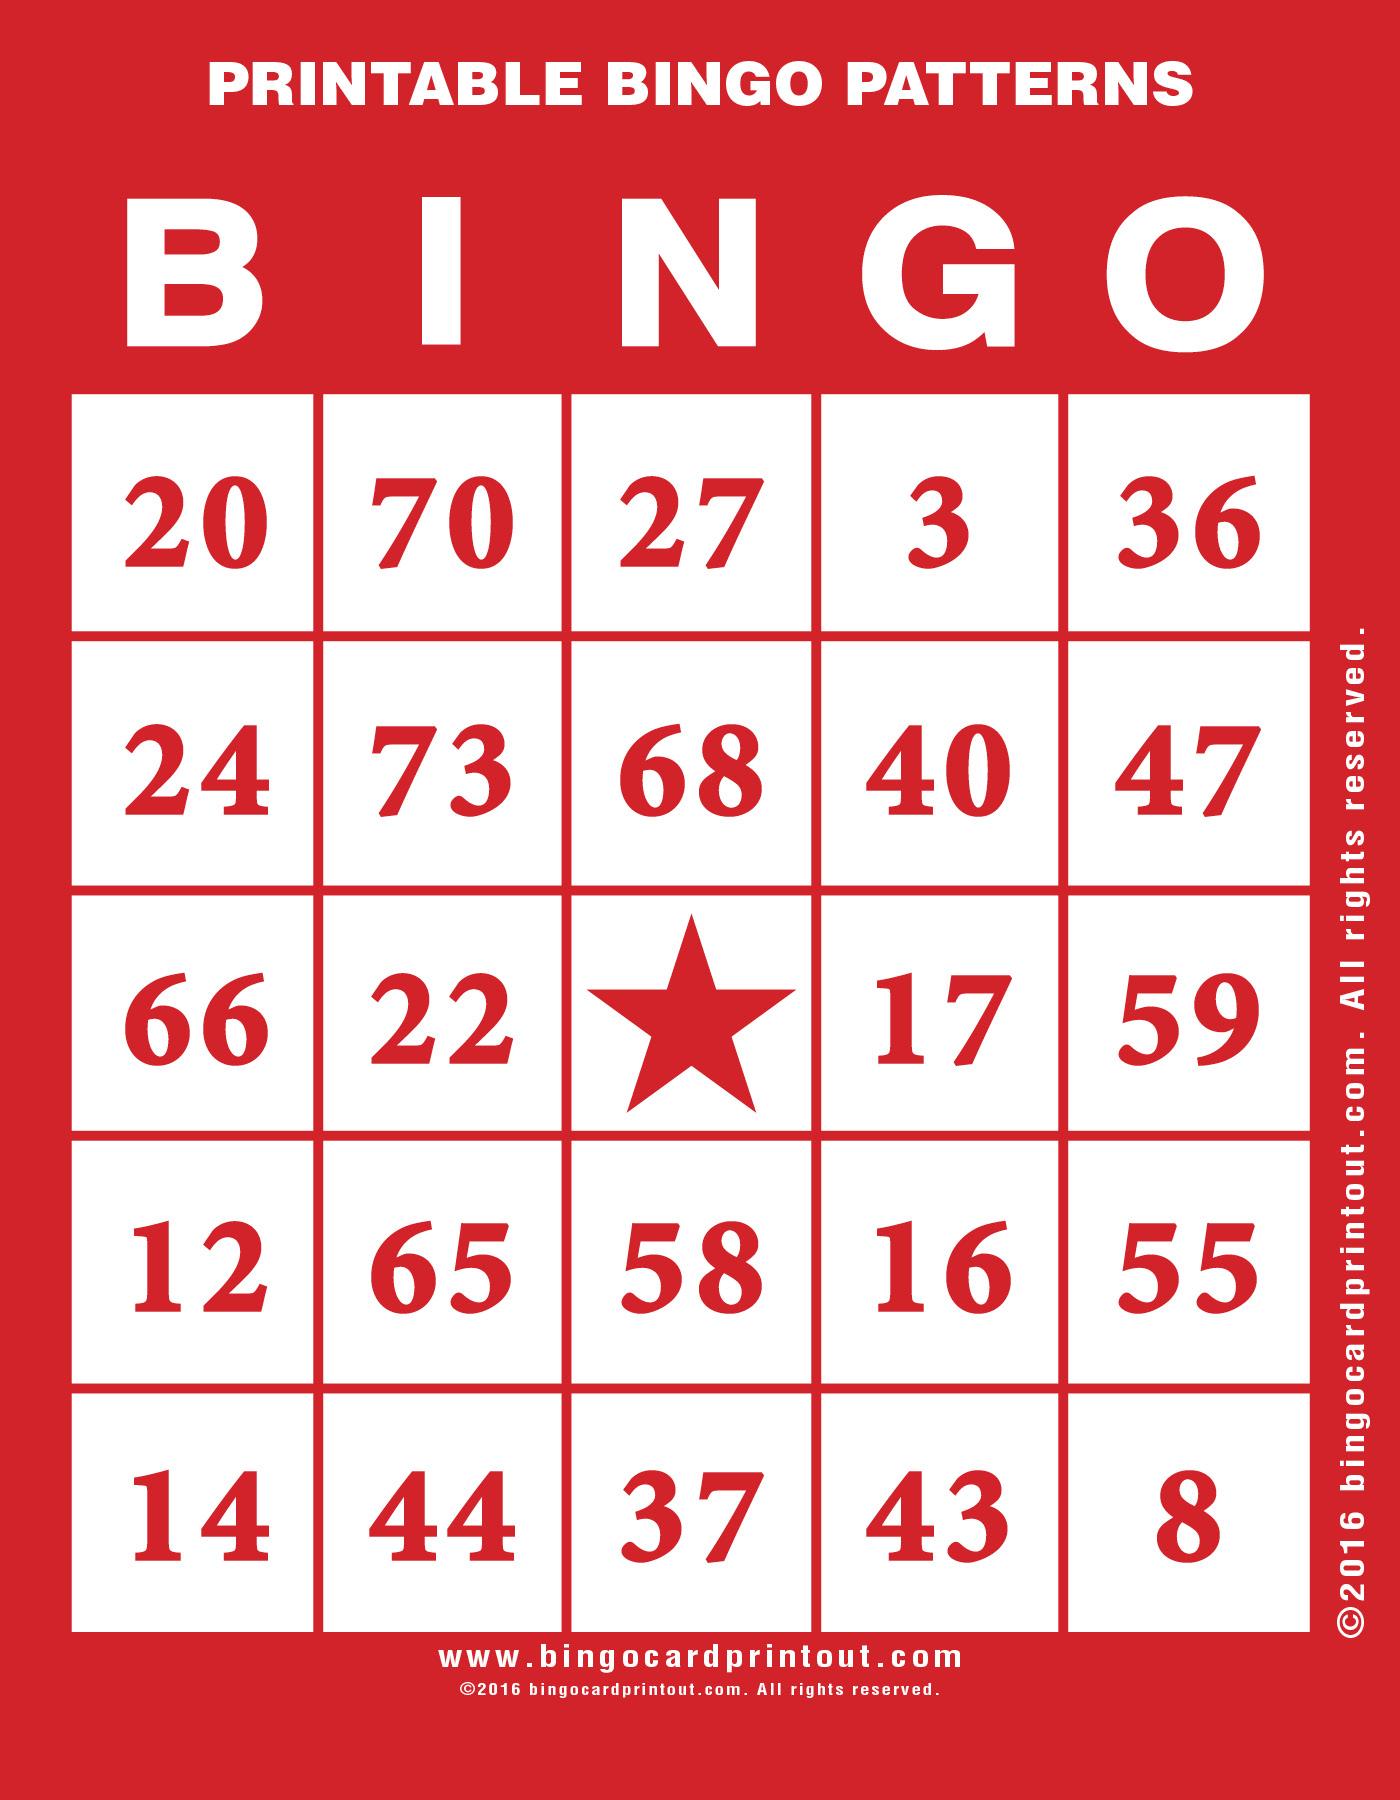 photograph about Bingo Patterns Printable known as Printable Bingo Designs -